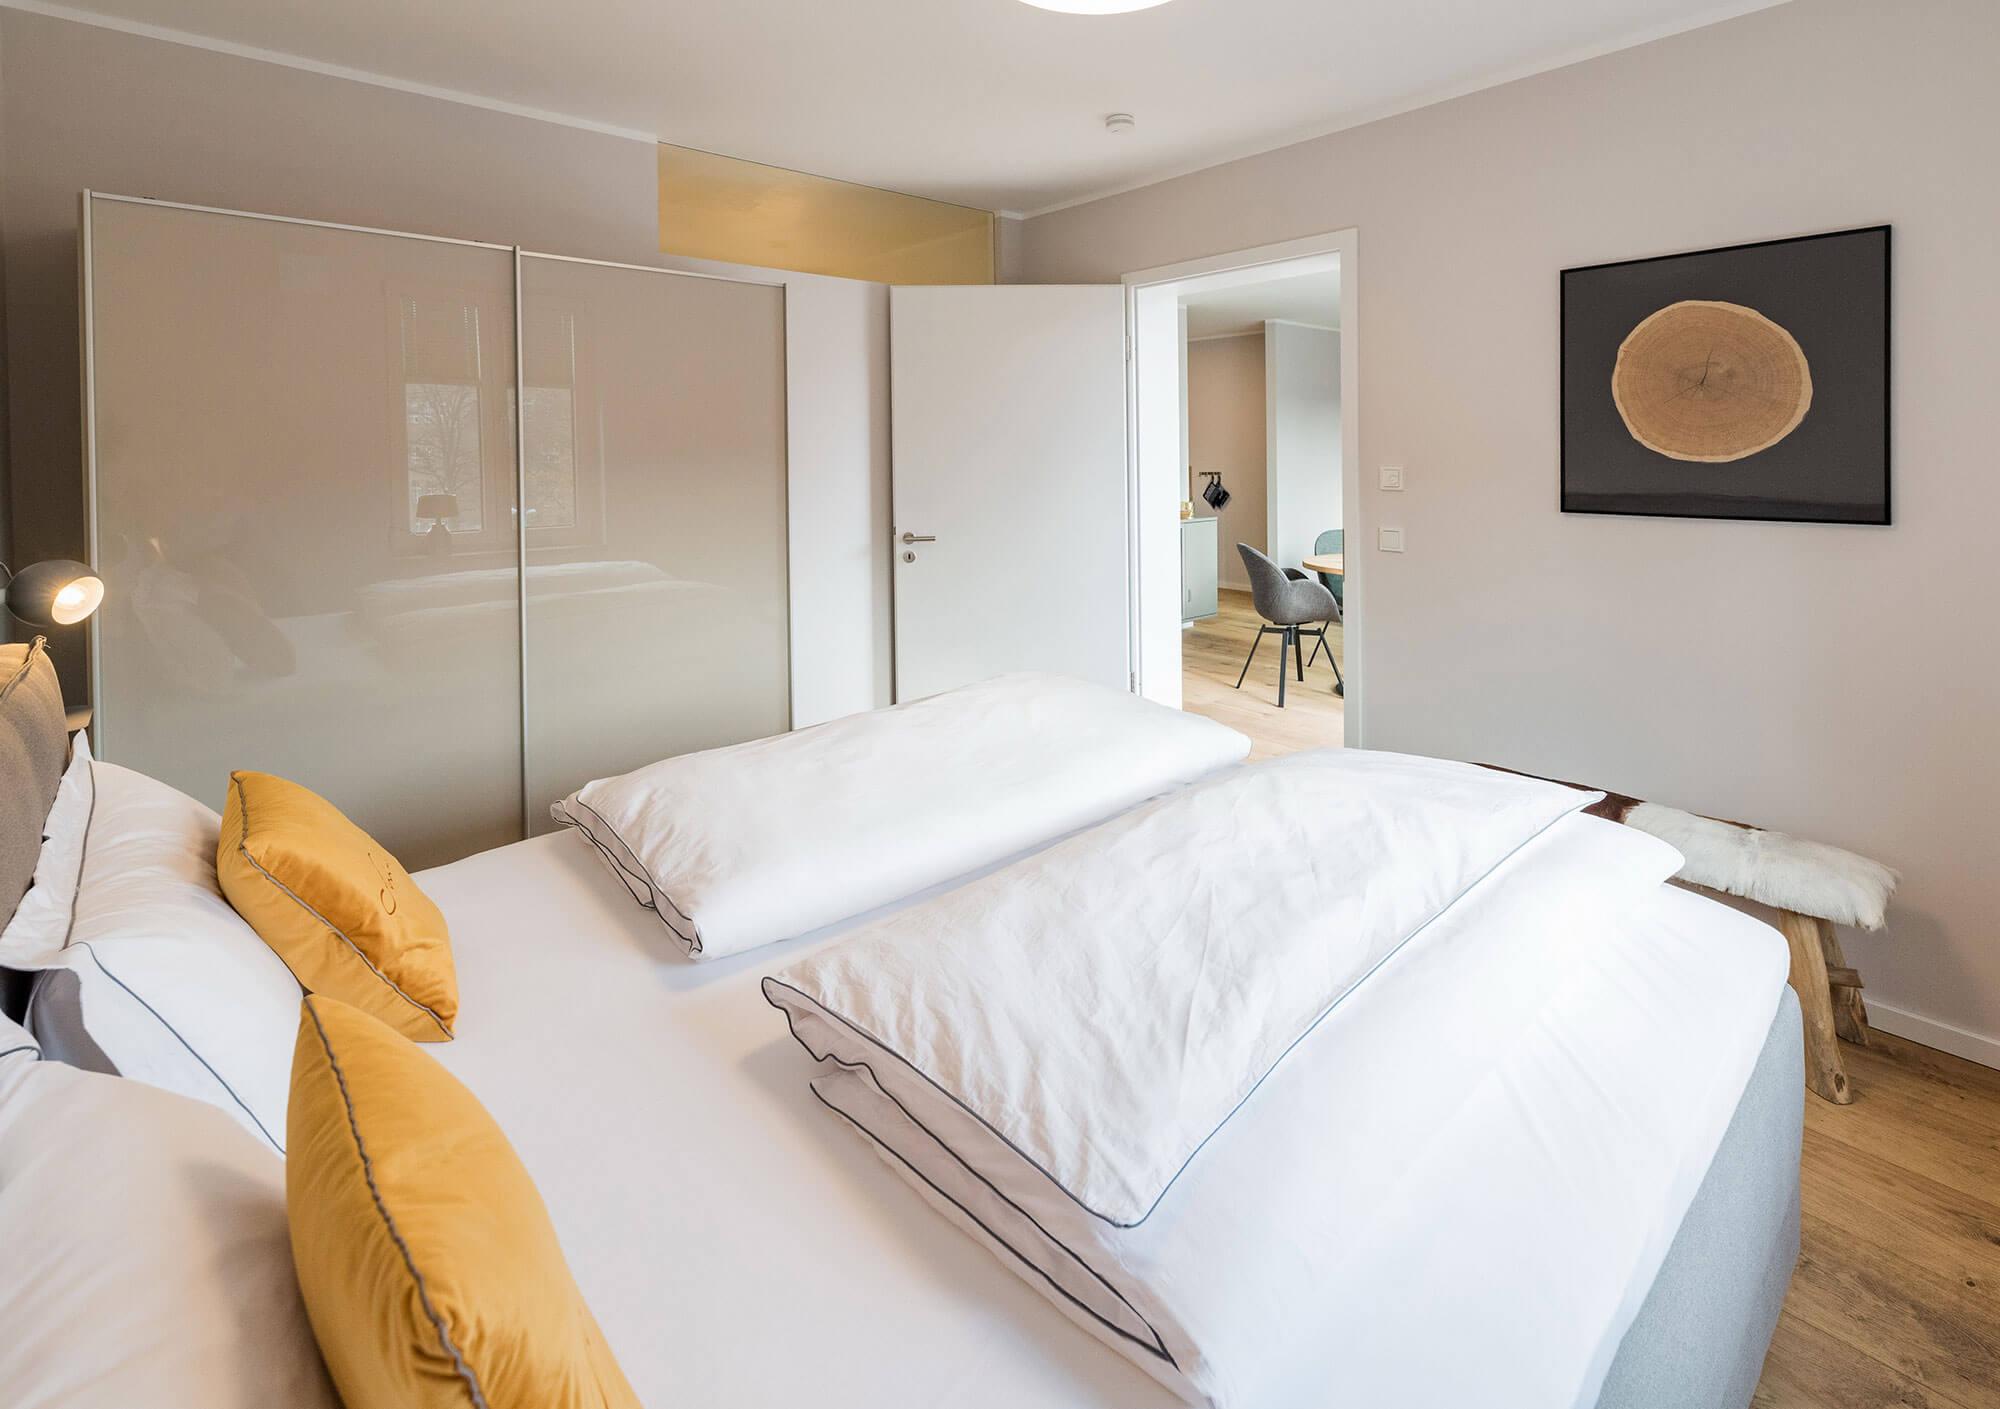 Ferienwohnung Thüringen – Select Suite